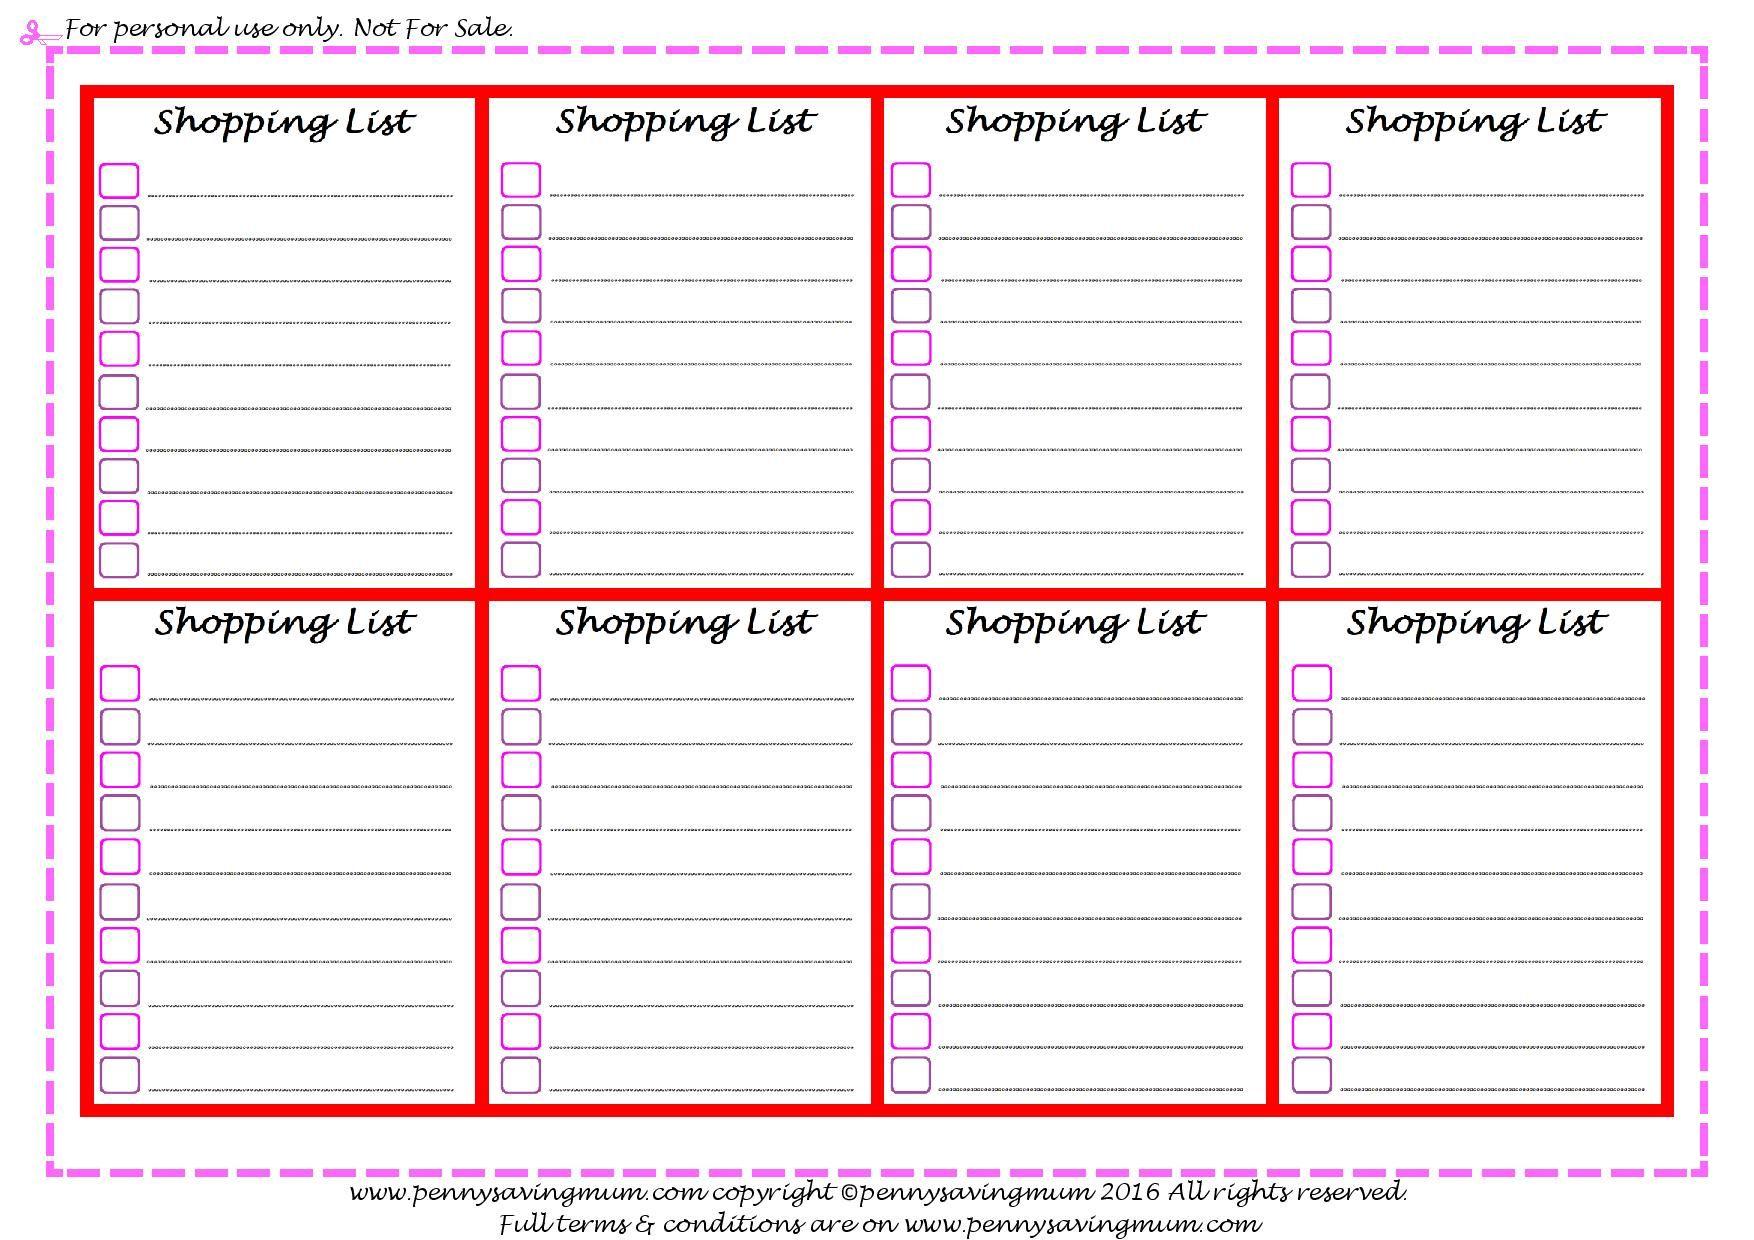 Shopping Lists Short